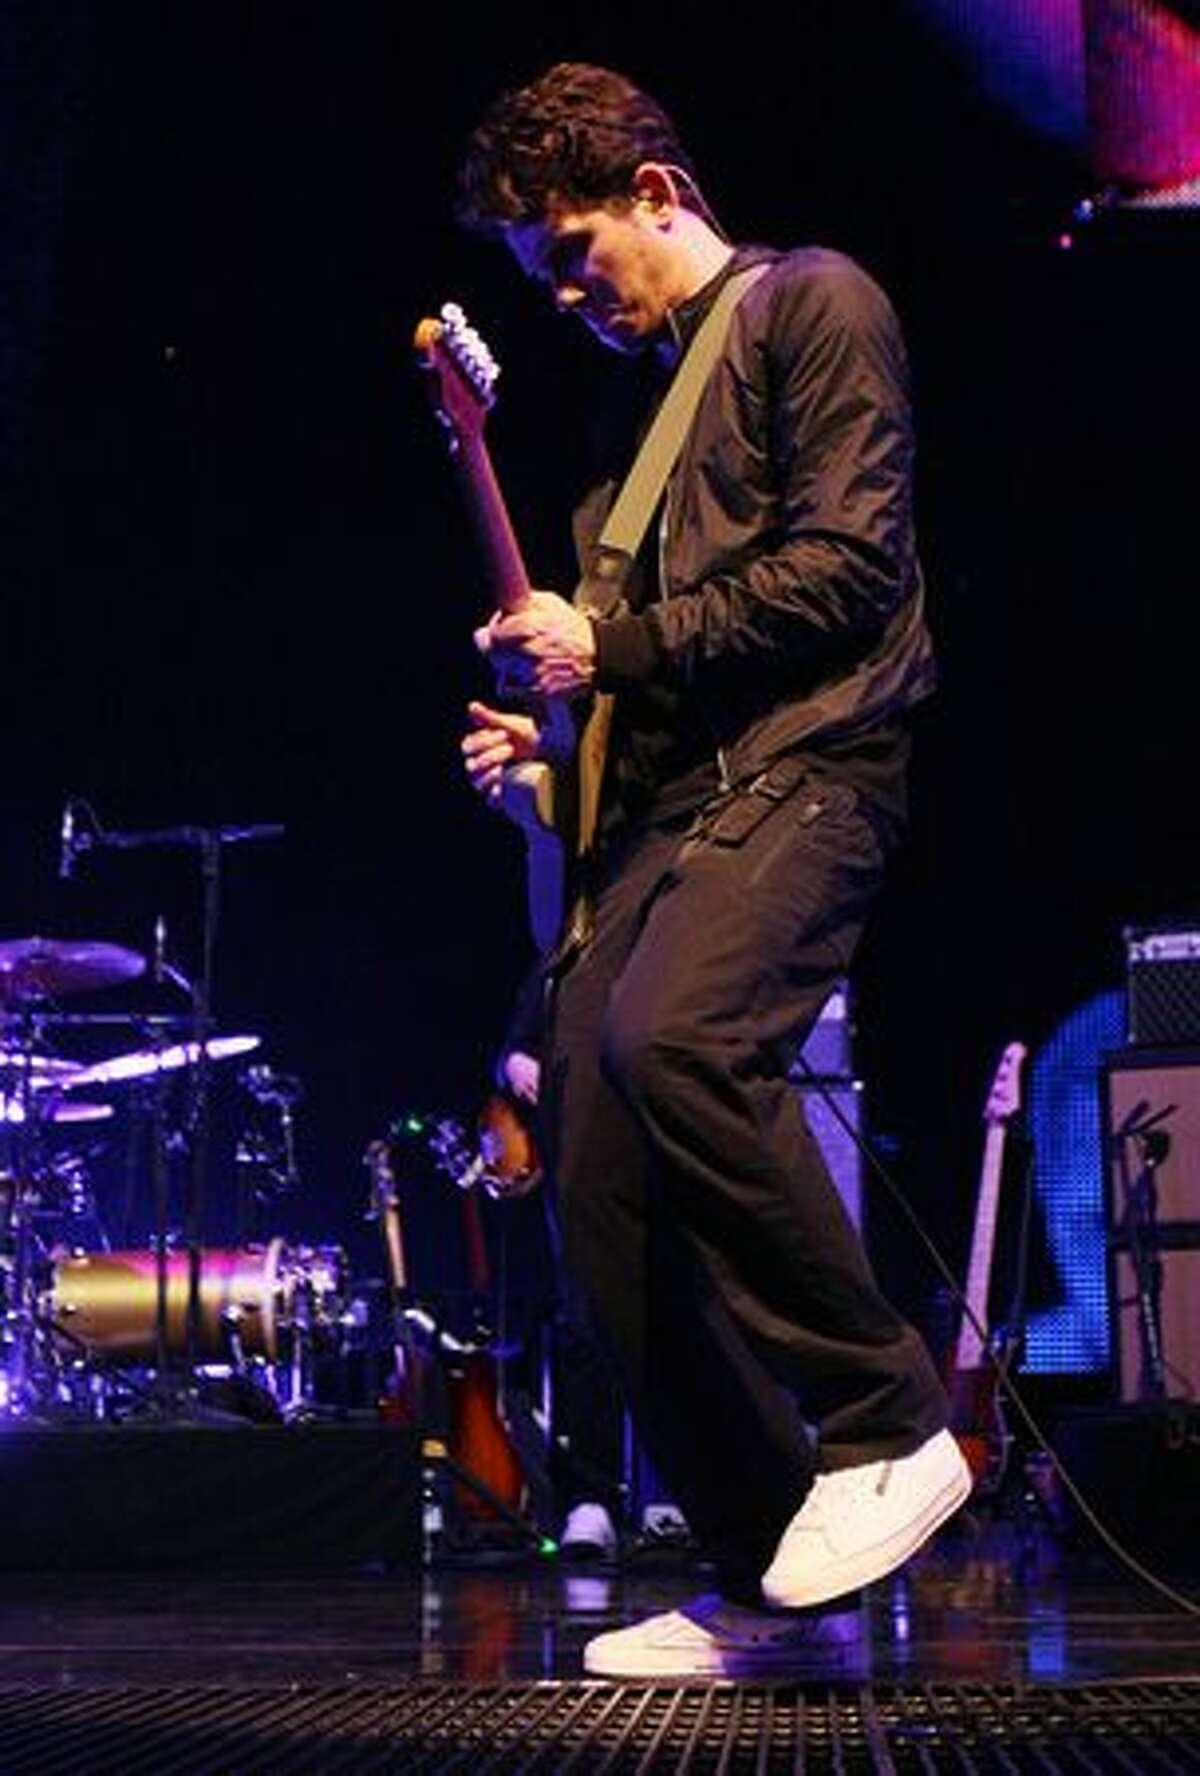 John Mayer performs at KeyArena.